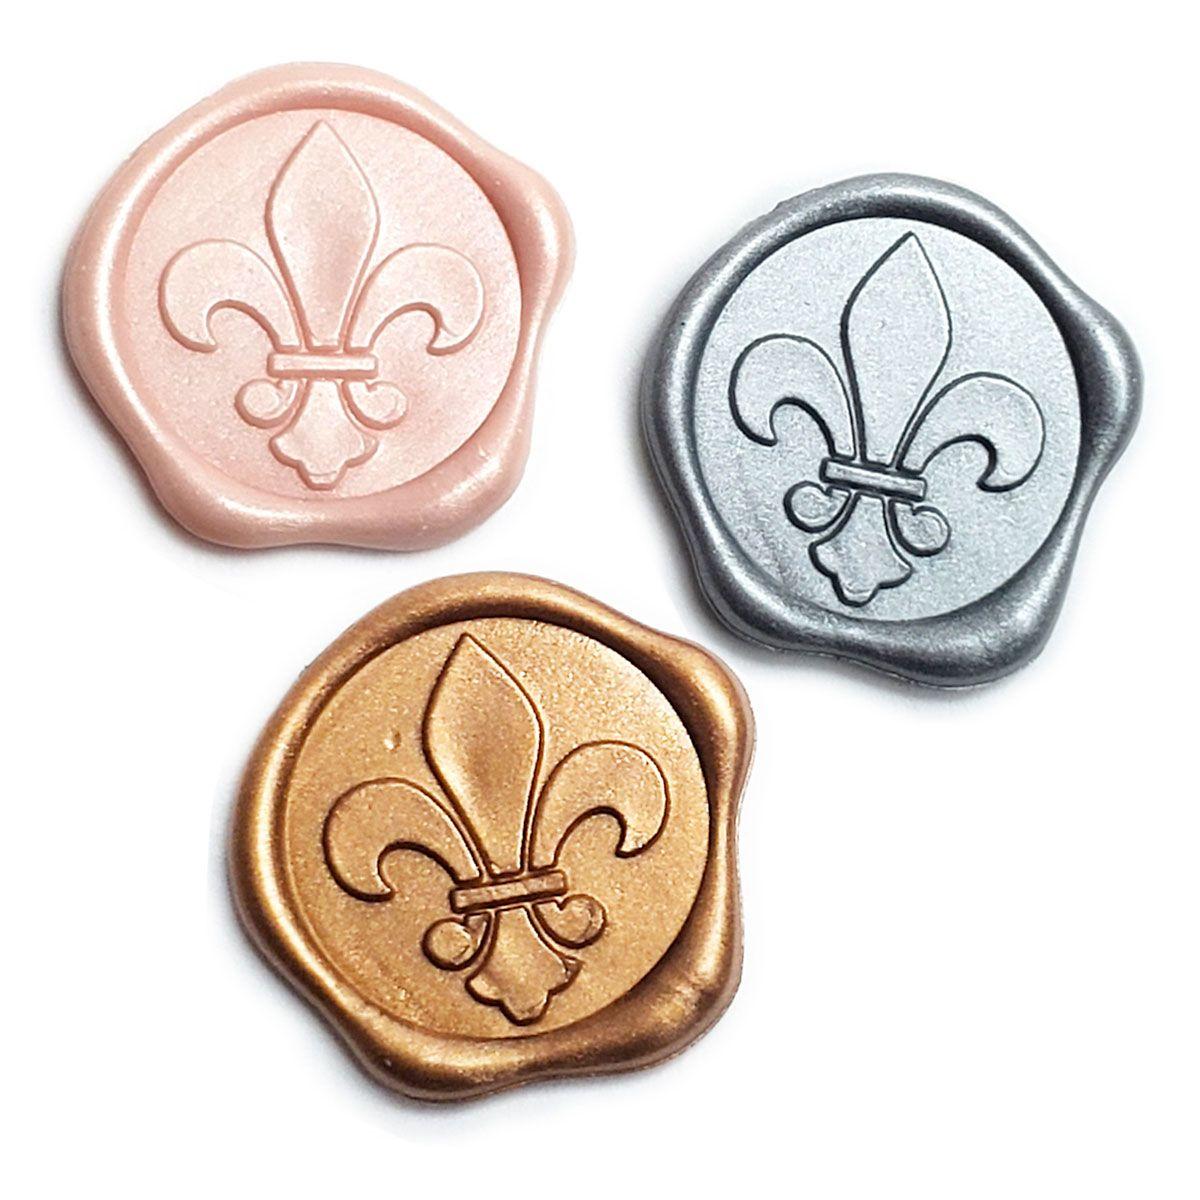 Fleur De Lis Adhesive Wax Seal Stickers